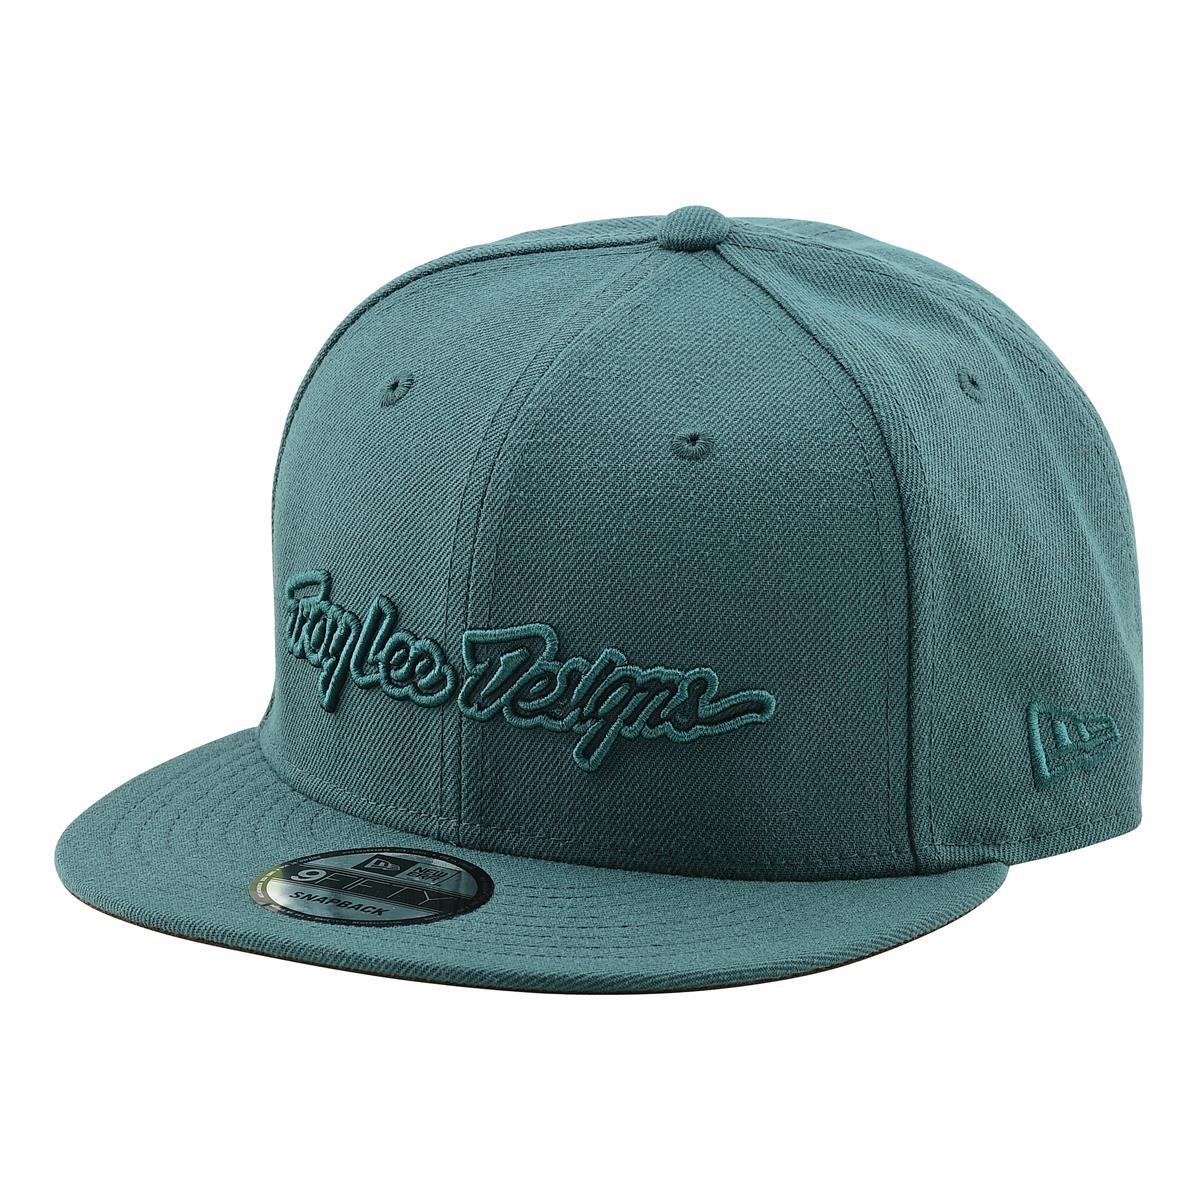 Troy Lee Designs Snapback Cap Classic Signature Pine Needle Green